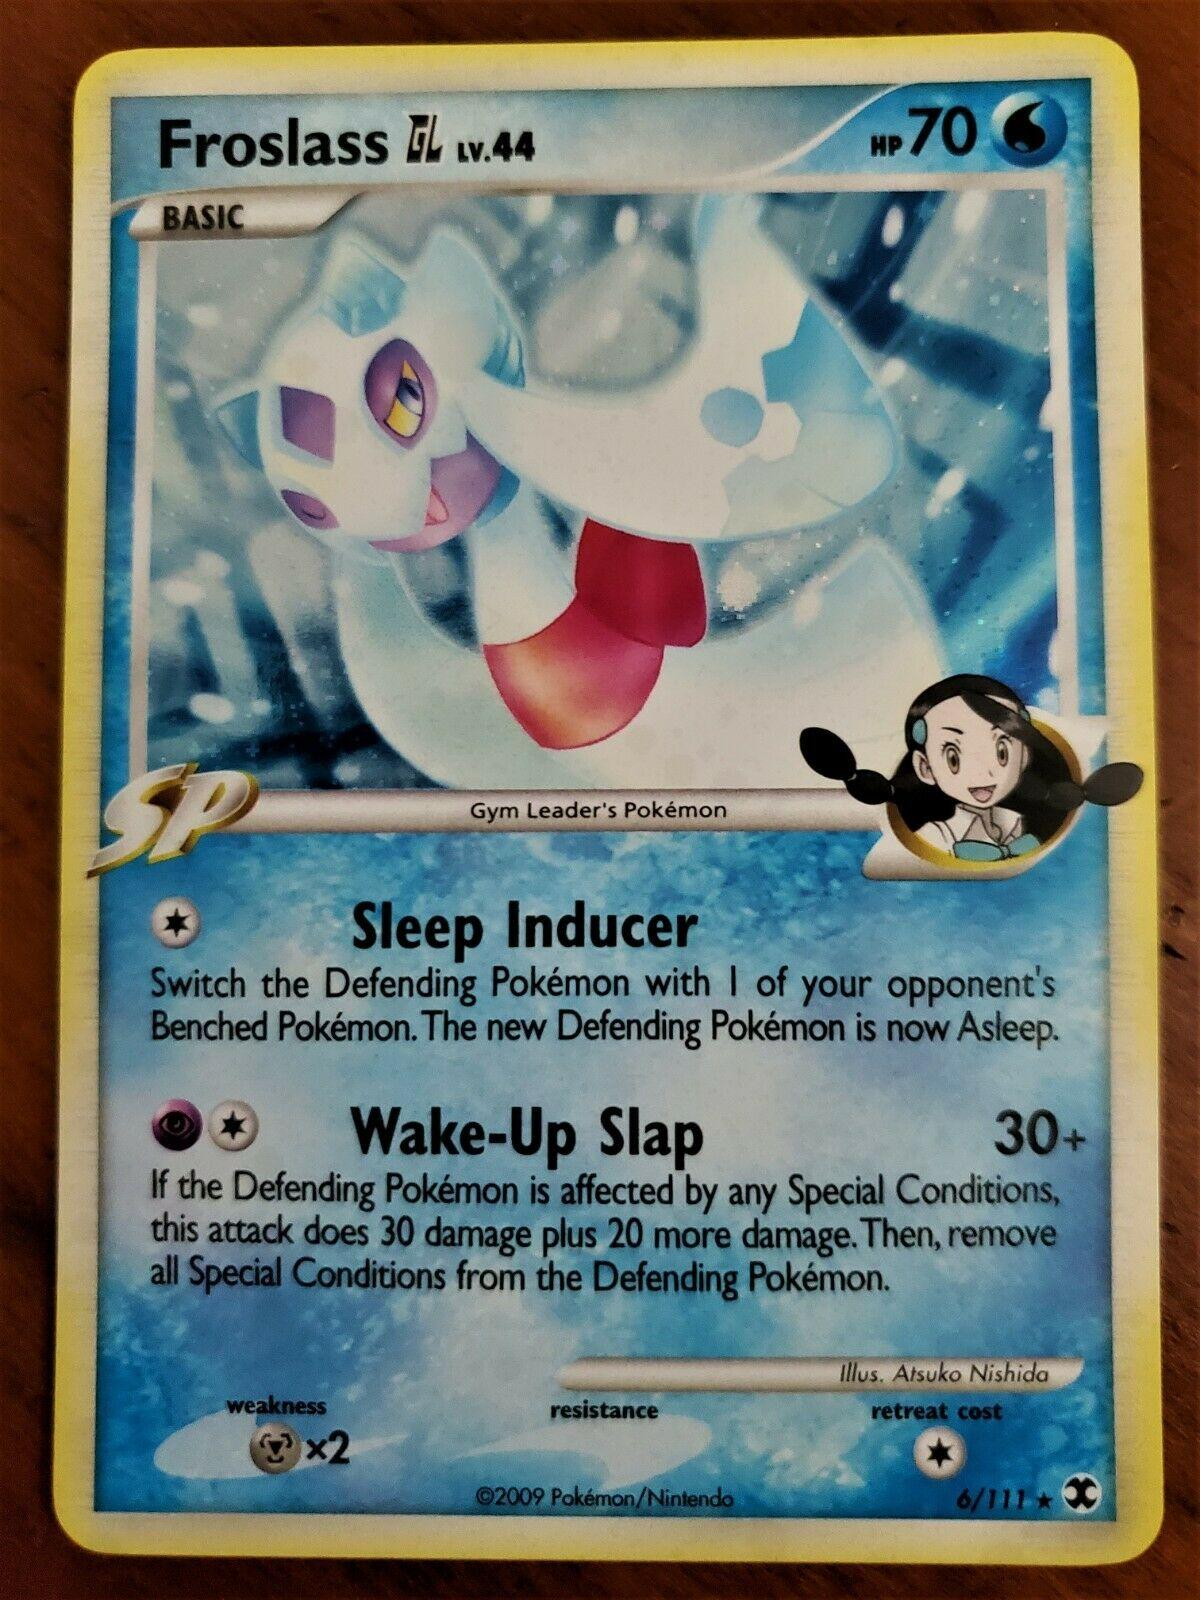 Http Www Pokemon Gl Com : pokemon, Froslass, Rising, Rivals, 6/111, Value:, [scrape_image:10] <script type=